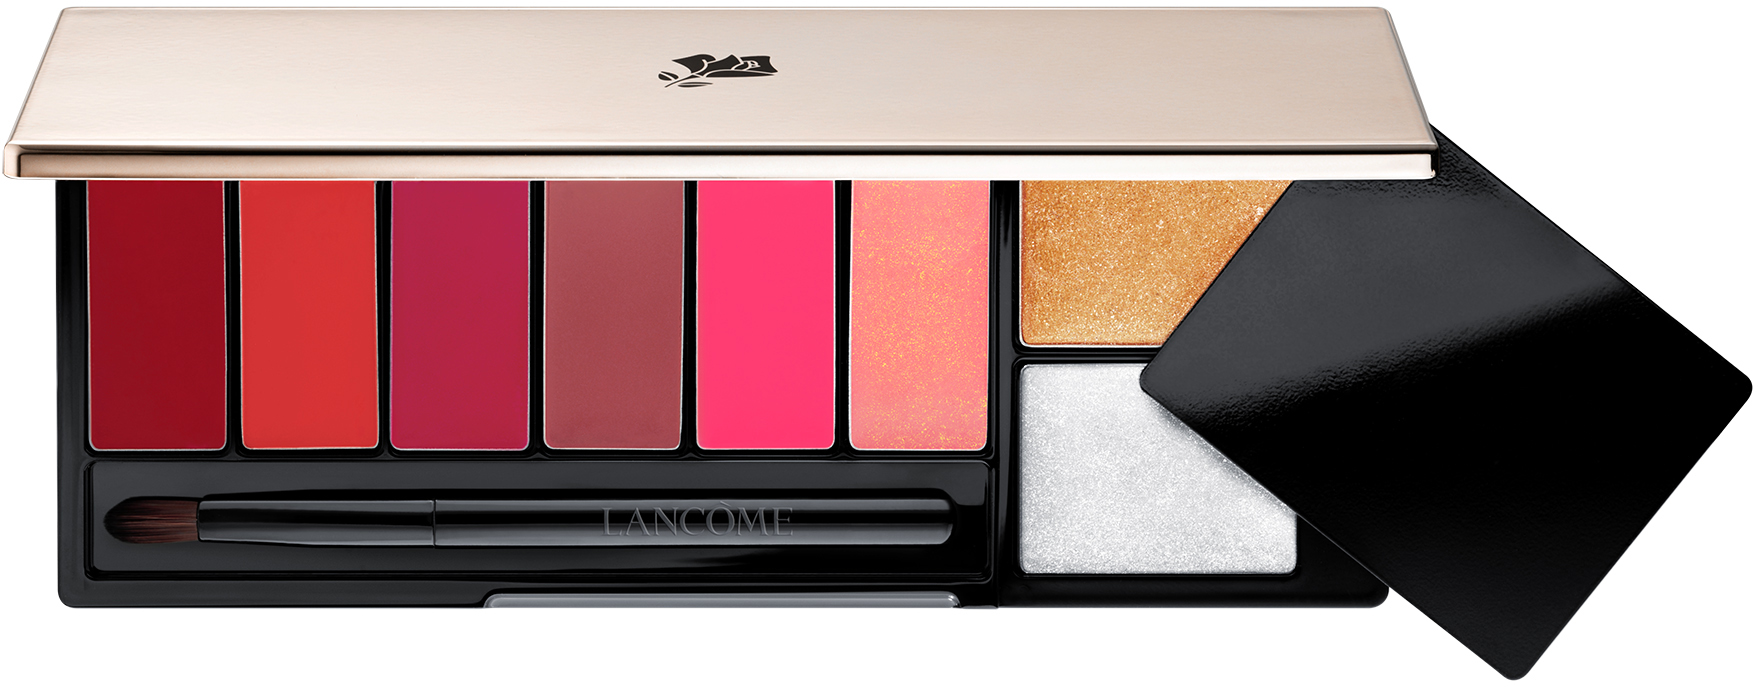 L'Absolu  Rouge Palette Lipstick